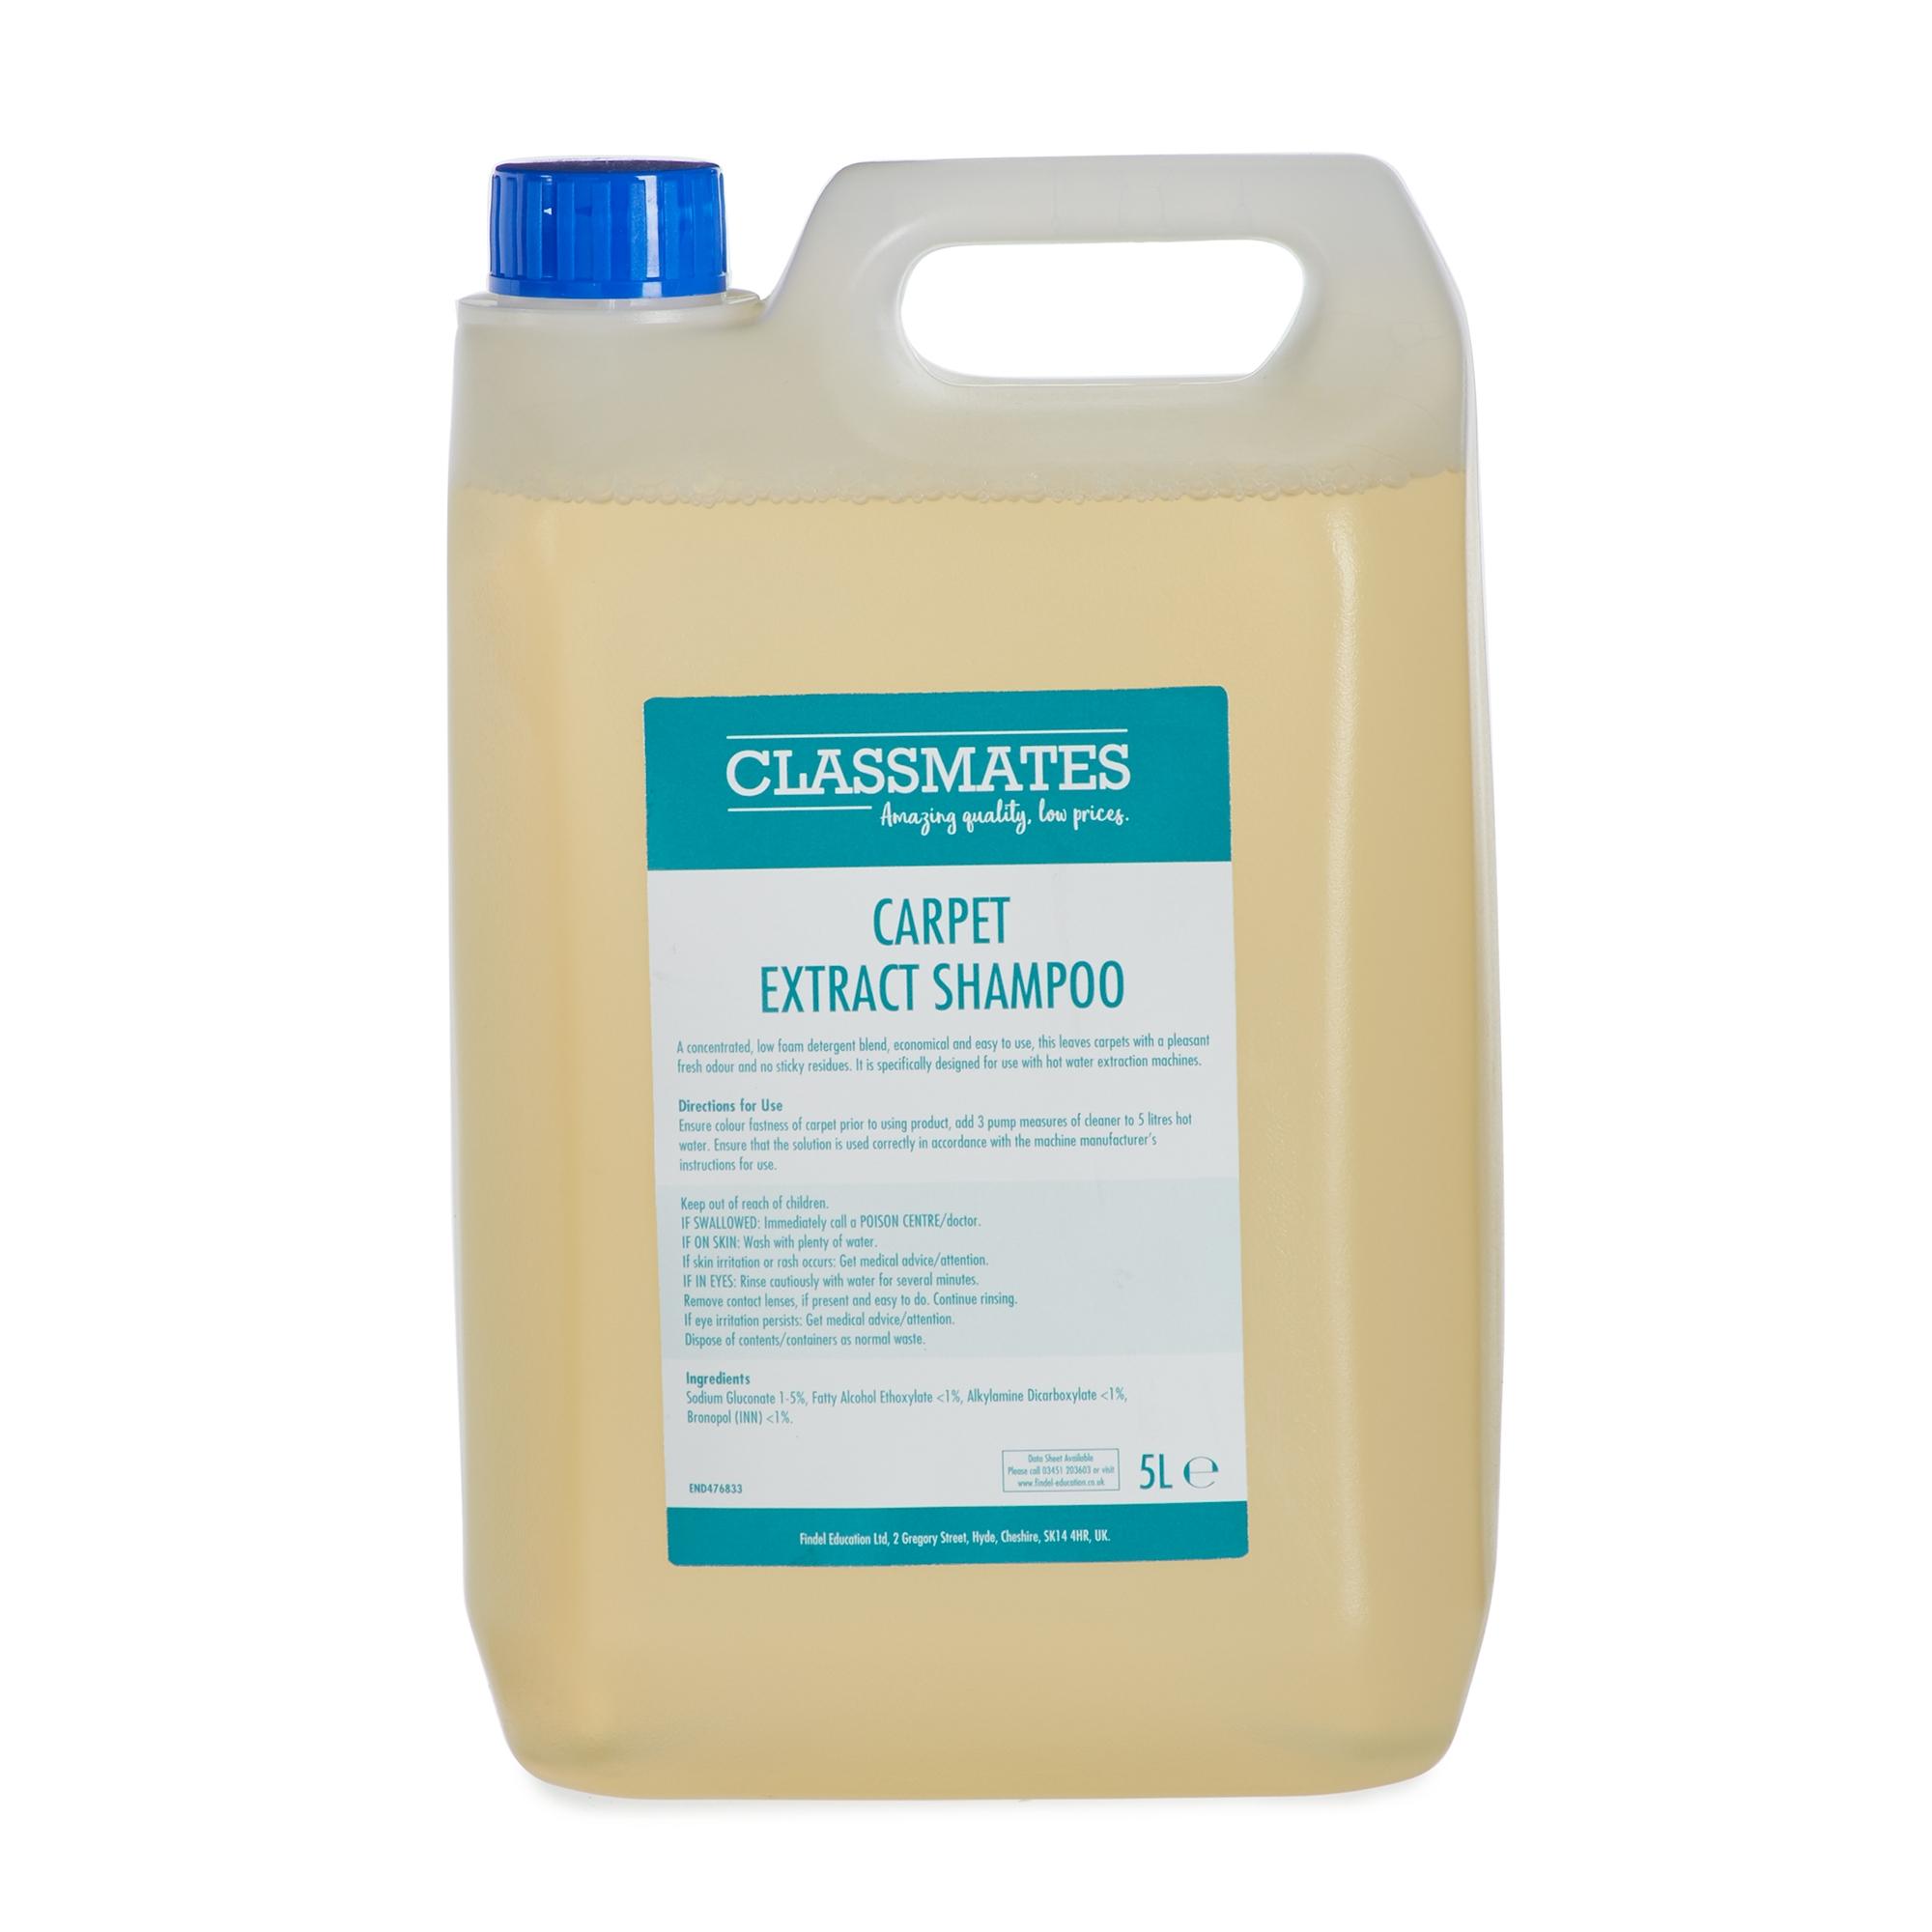 Classmates Carpet Extraction Shampoo 5L (Case of 2)